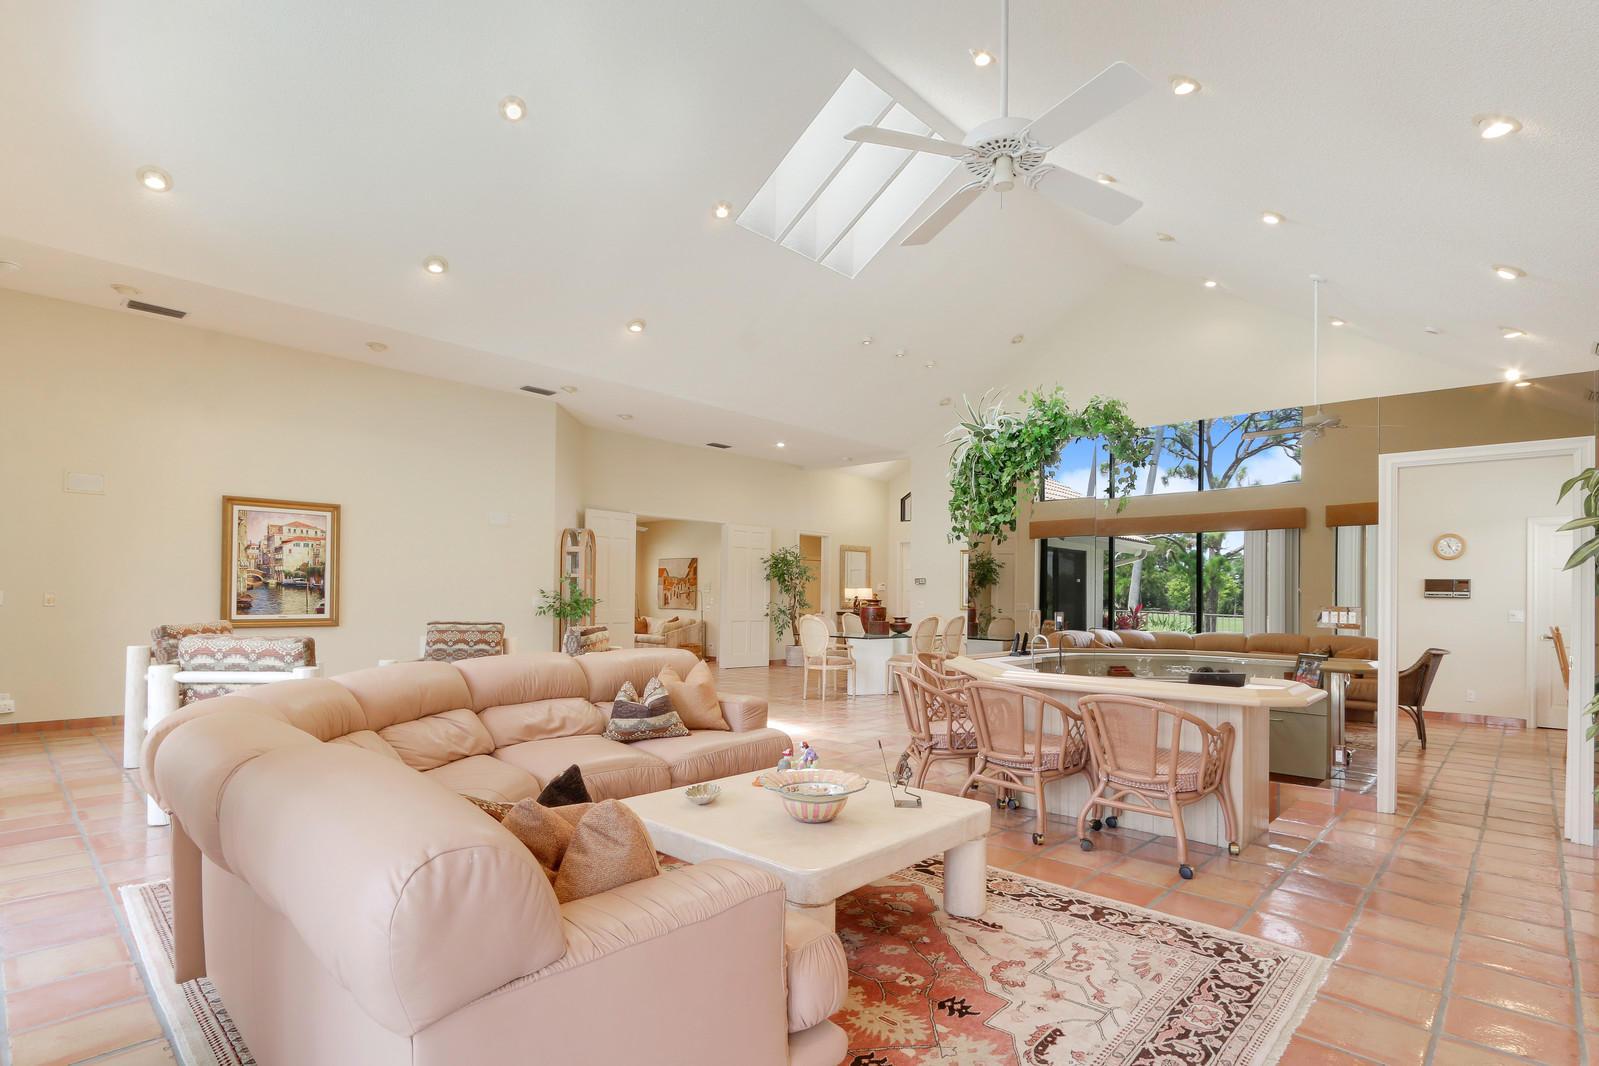 13813 Rivoli Drive, Palm Beach Gardens, Florida 33410, 3 Bedrooms Bedrooms, ,3.1 BathroomsBathrooms,A,Single family,Rivoli,RX-10454593